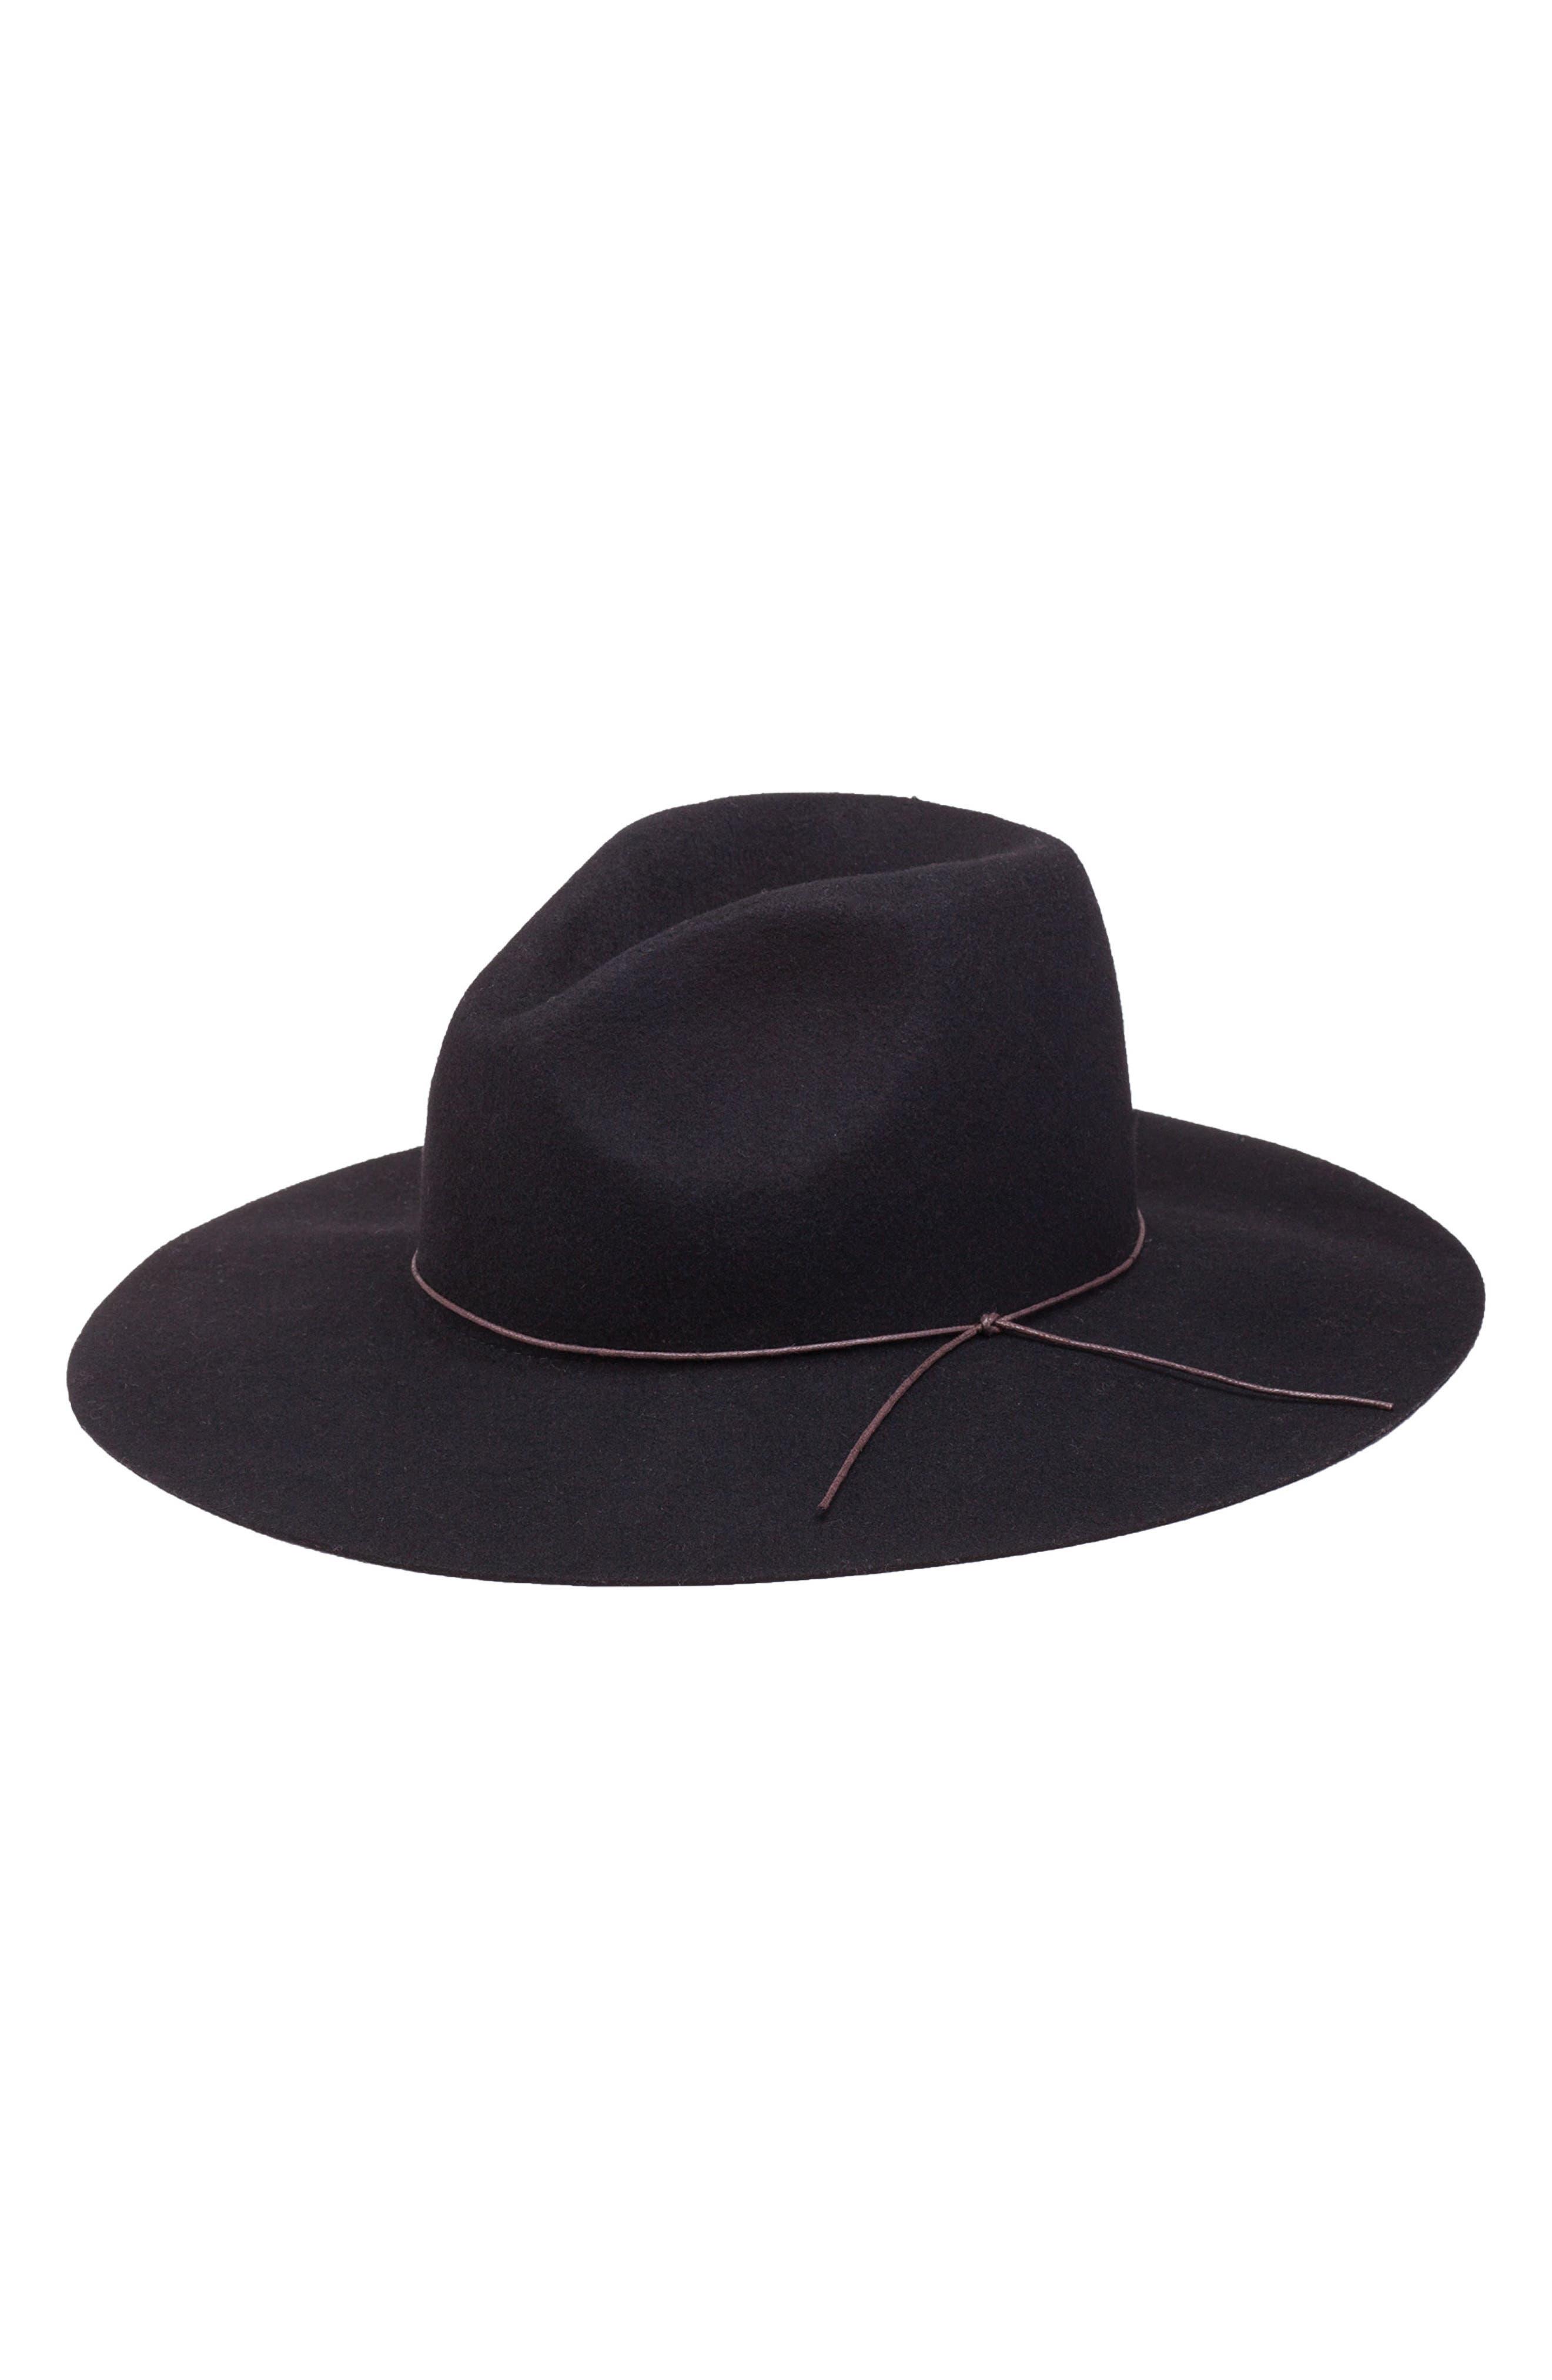 Zima Felted Wool Hat,                             Main thumbnail 1, color,                             BLACK